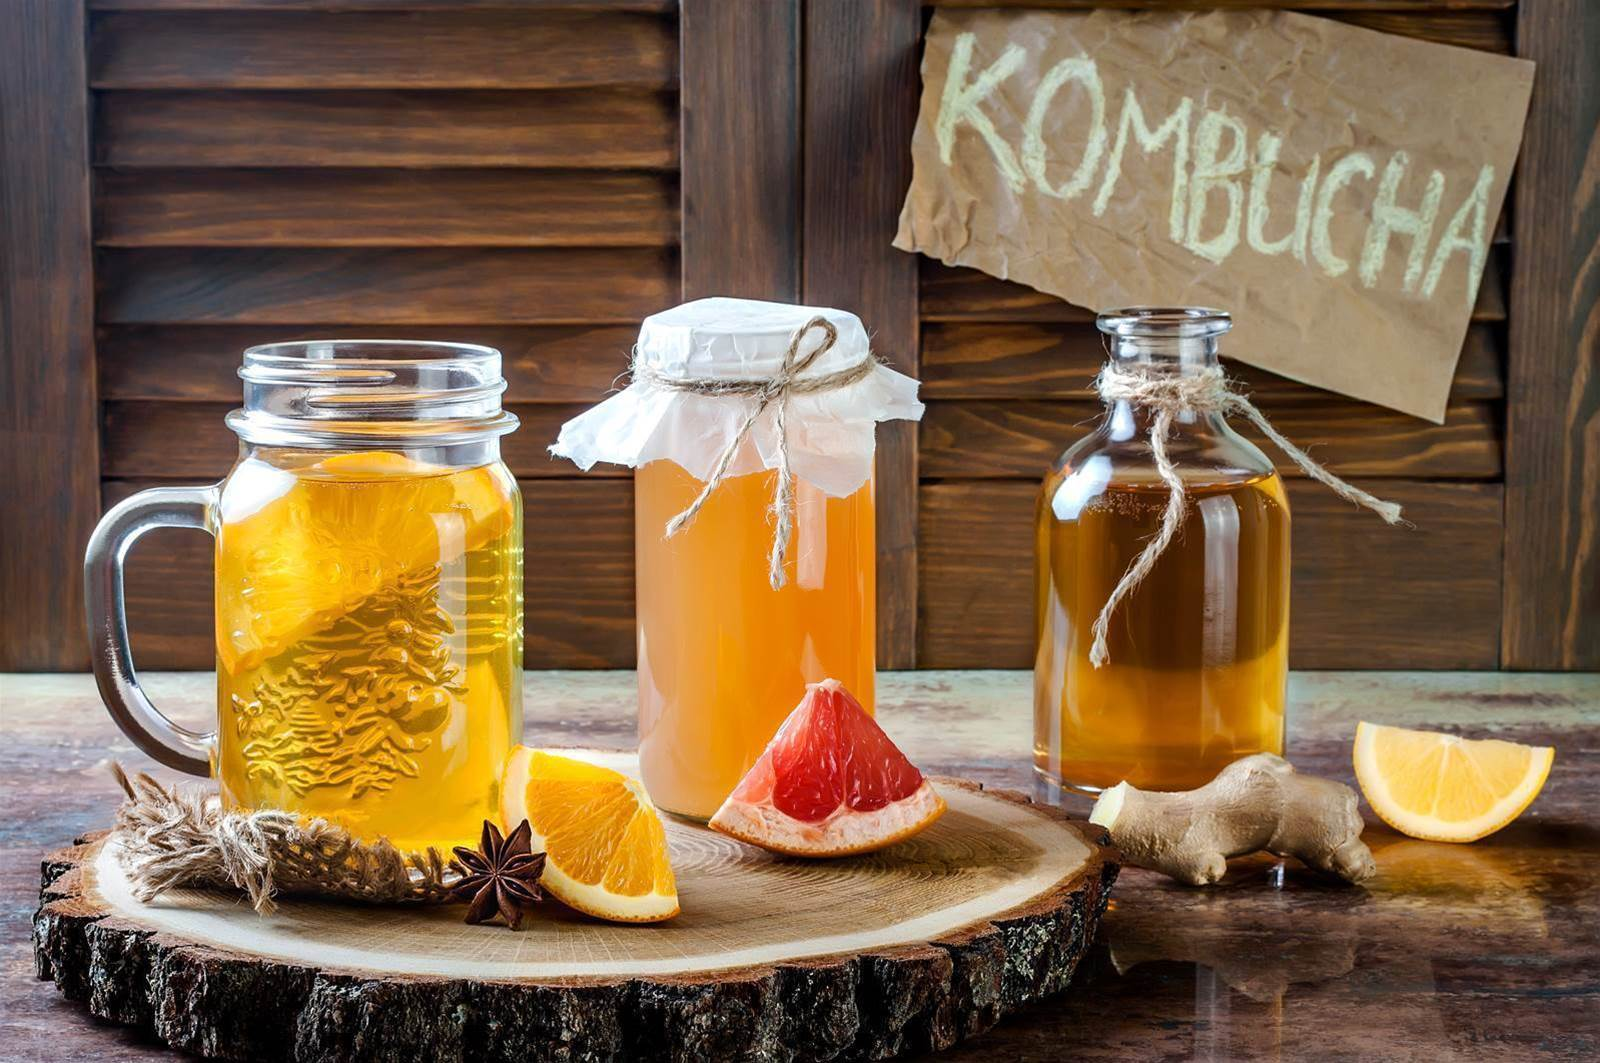 Five reasons to get into kombucha